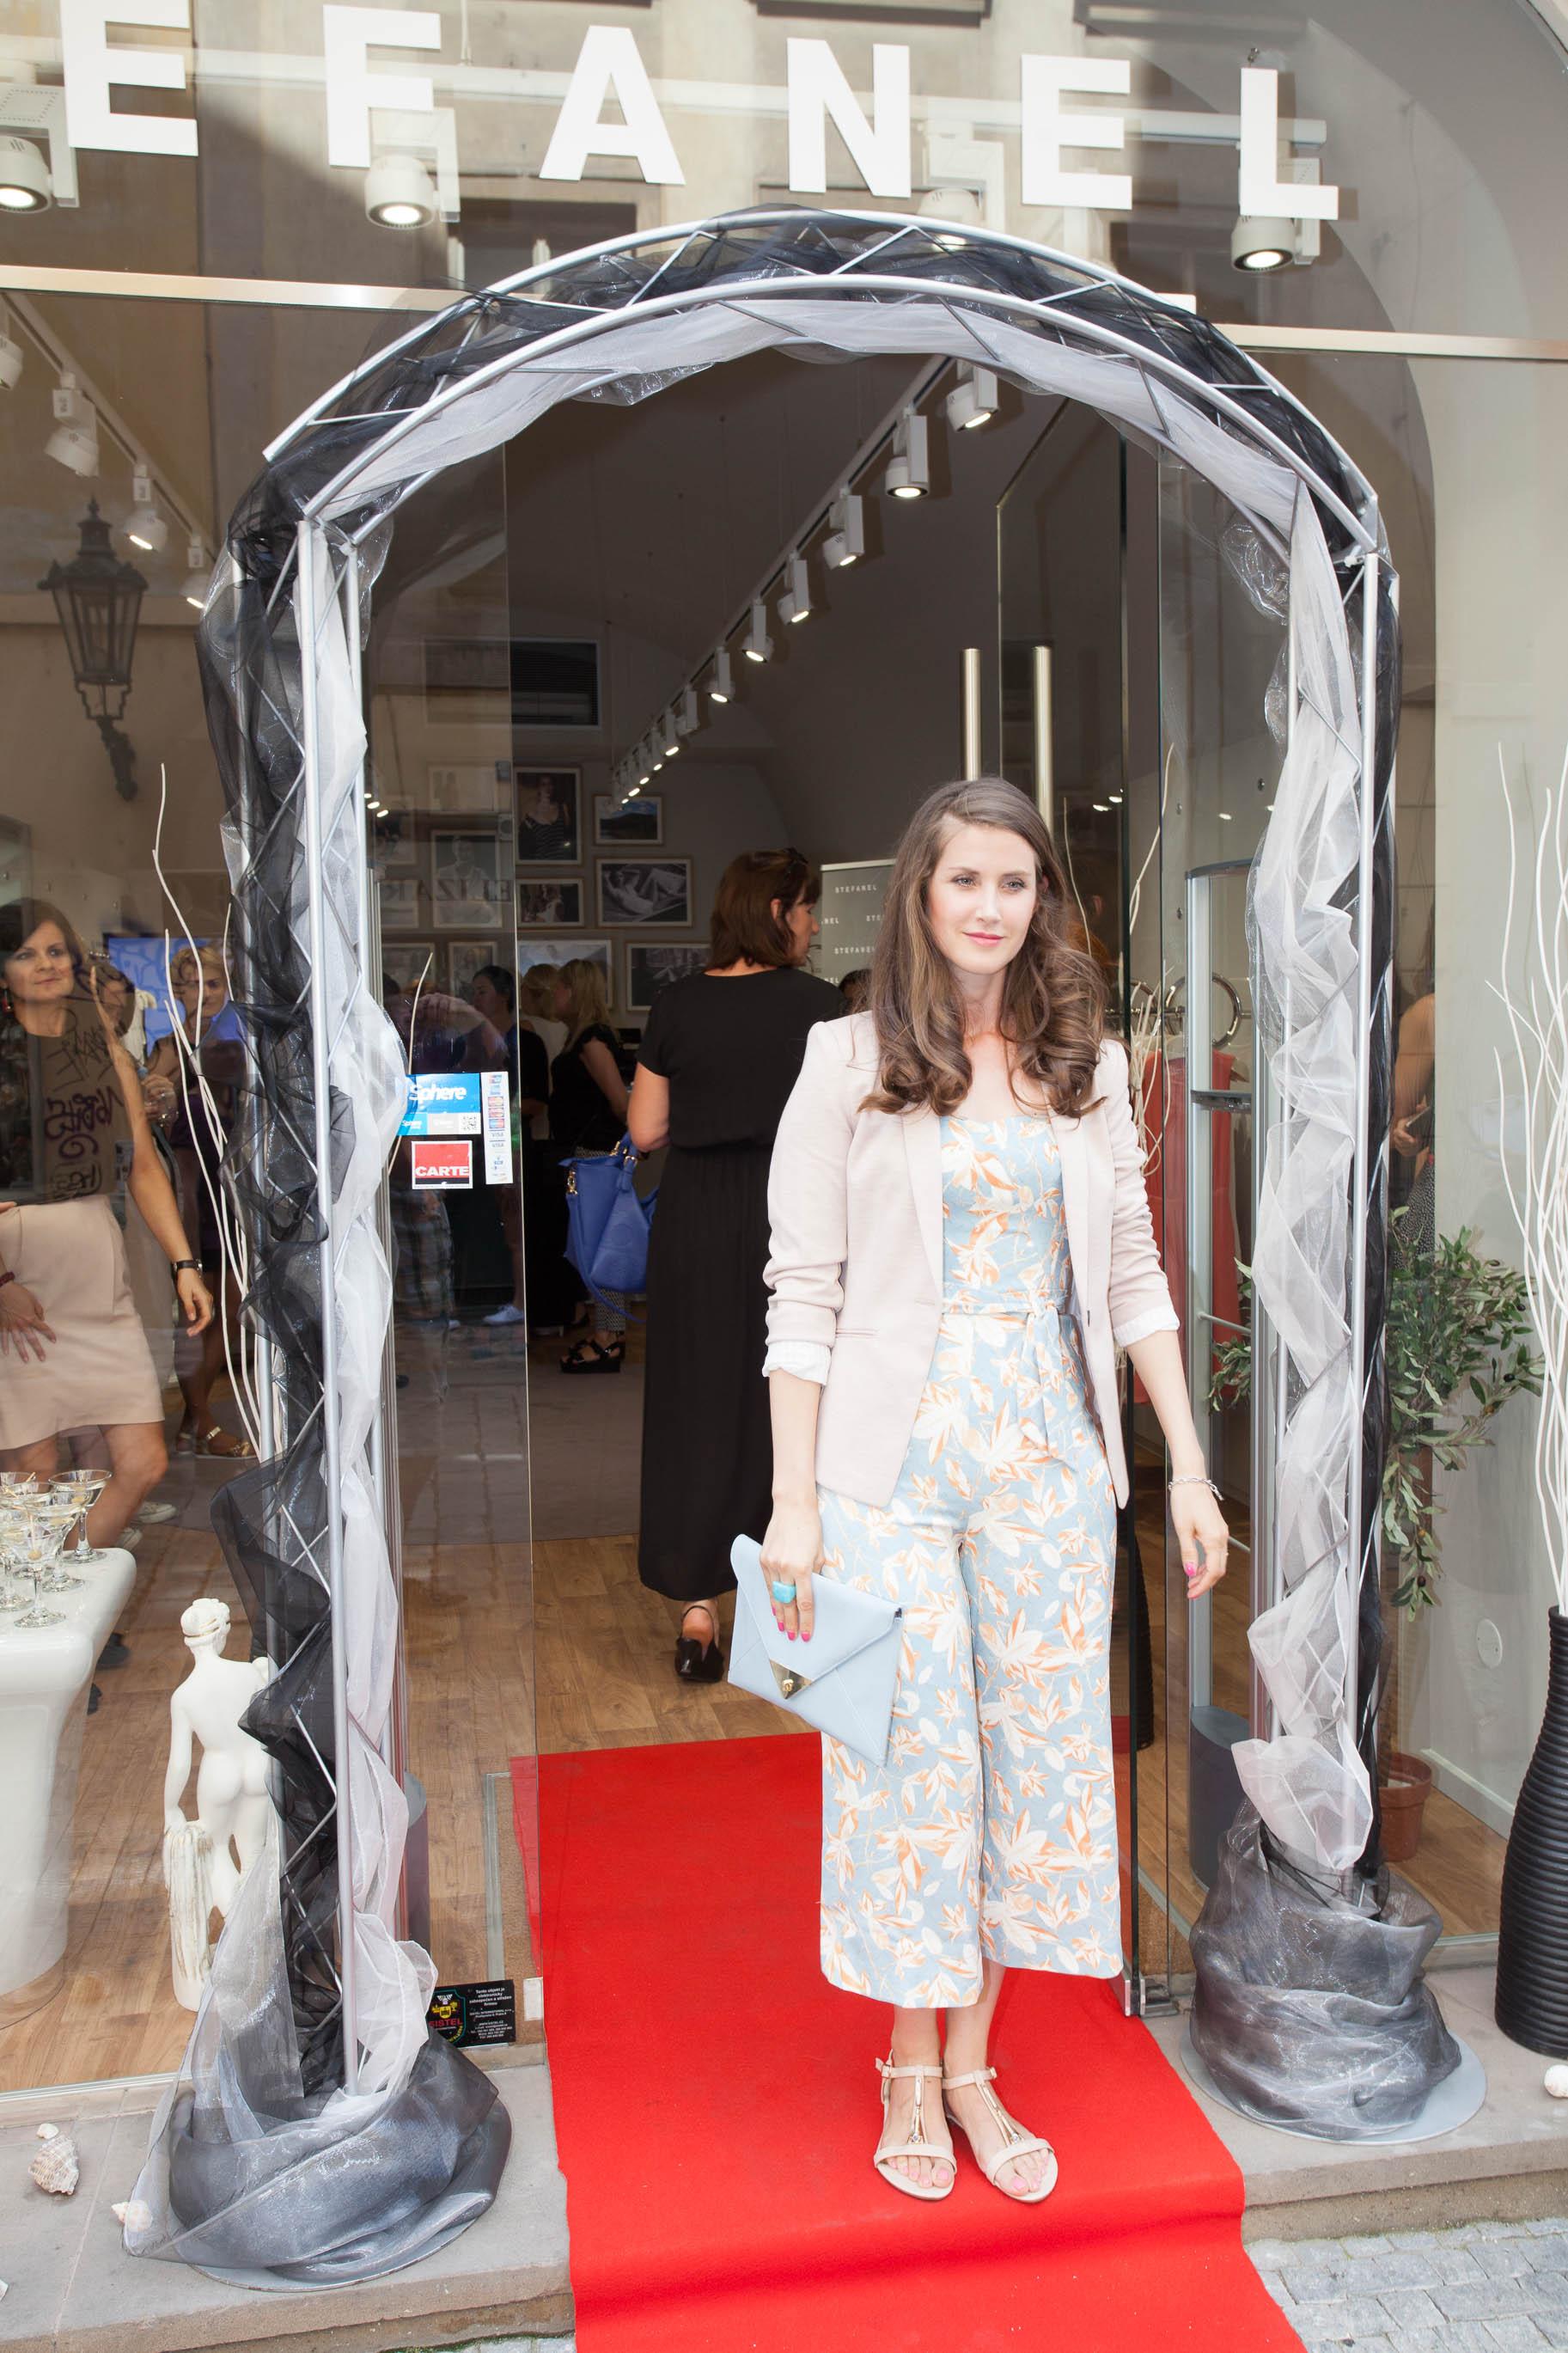 Byli jsme na otev rac party butiku stefanel d ma magaz n for Ze kitchen galerie dress code